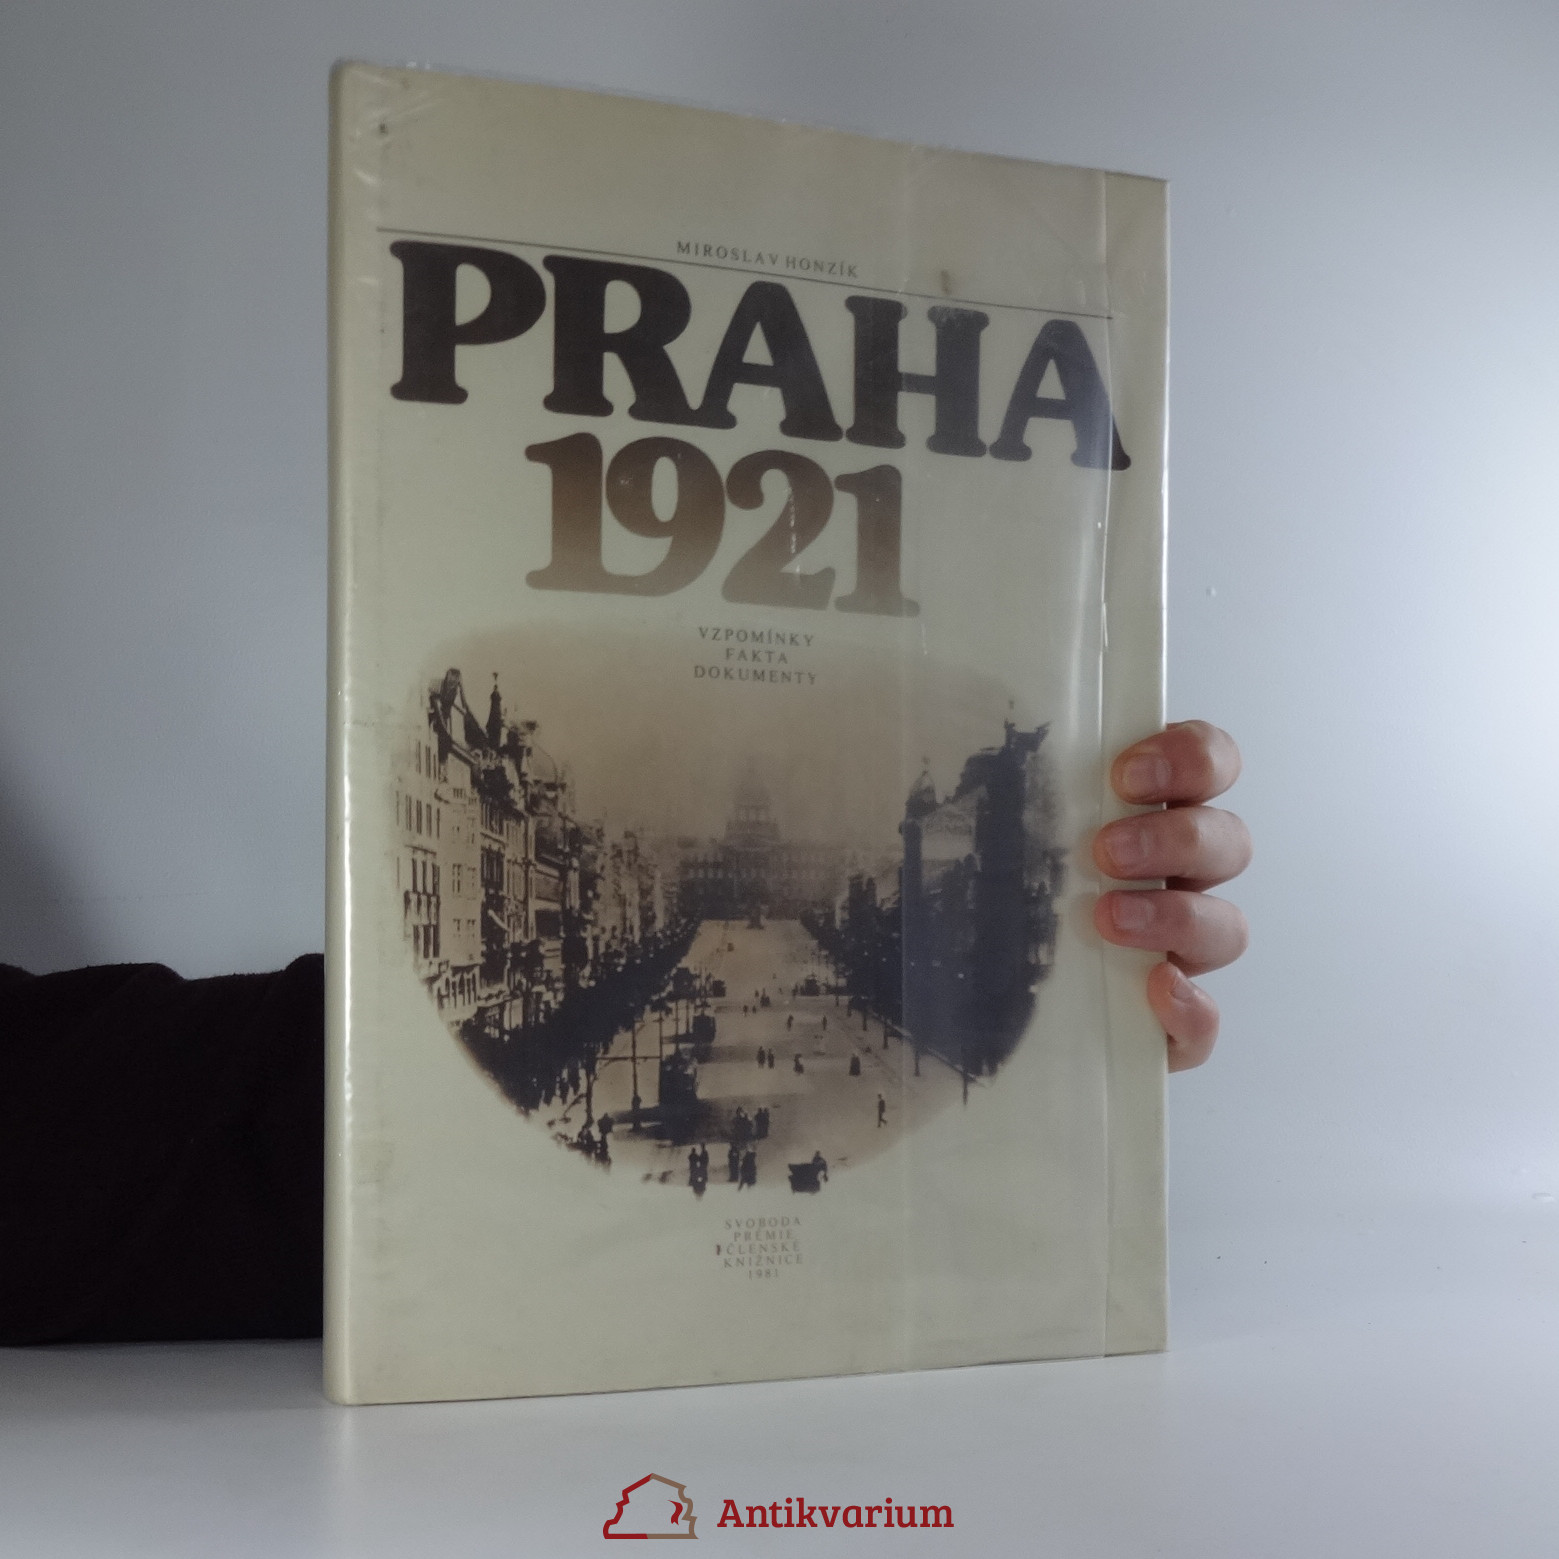 antikvární kniha Praha 1921: vzpomínky, fakta, dokumenty, 1981